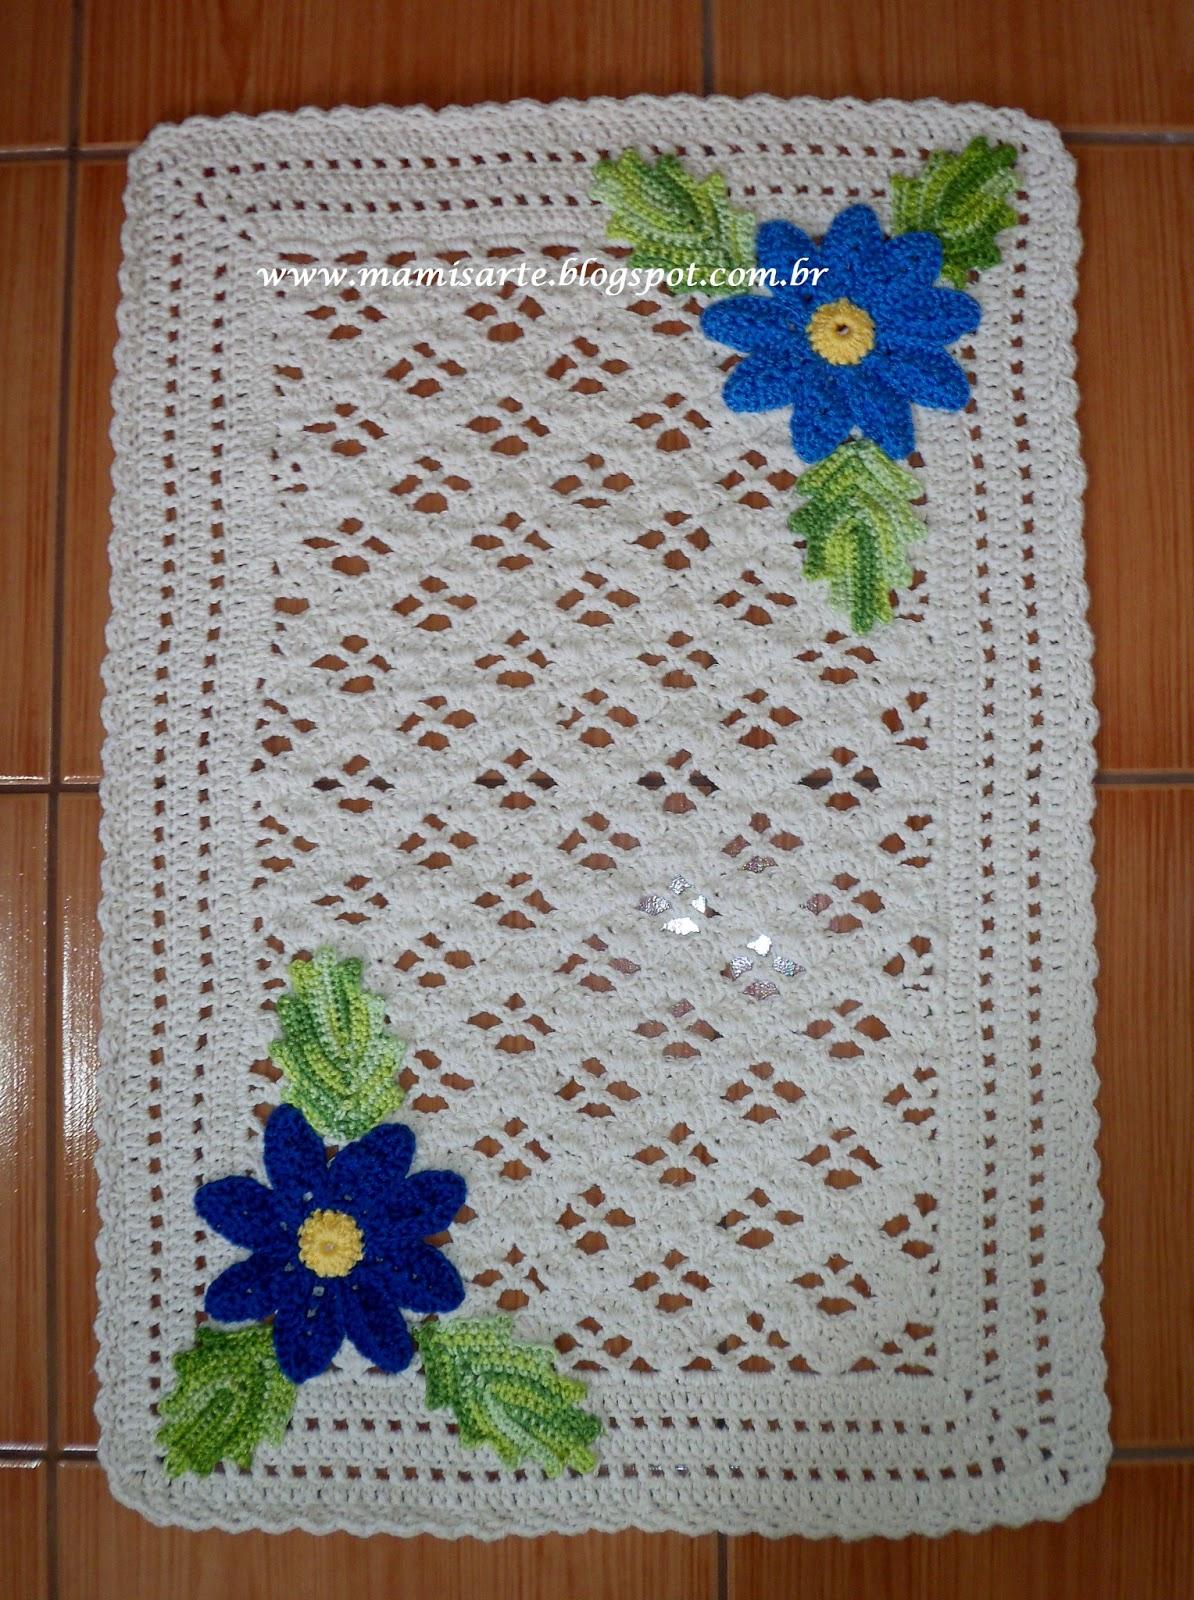 Tapete Margarida Vdeos Tapete De Croch Com Flor Margarida By Magia